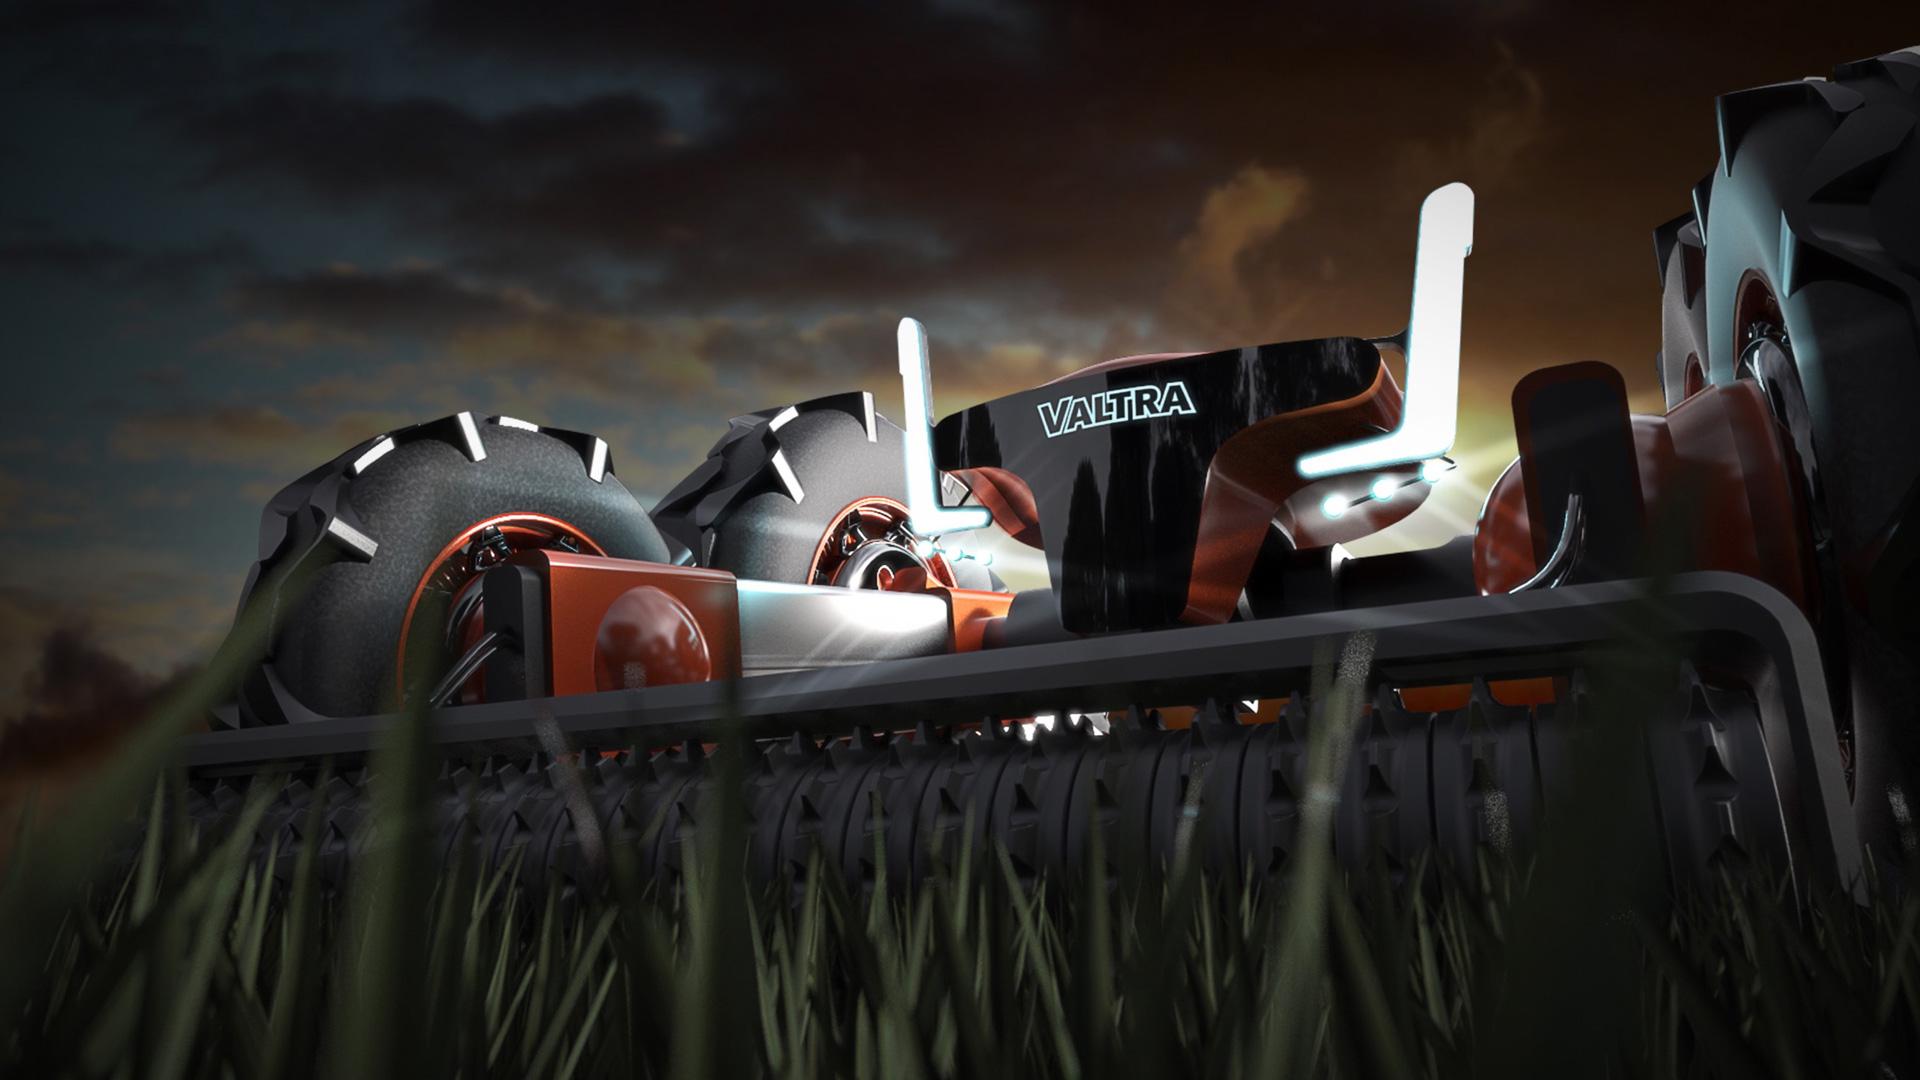 6-LPK_Valtra-FarmHand-2040-Tractor-Concept_Daniel-Yee.mp4.006-1